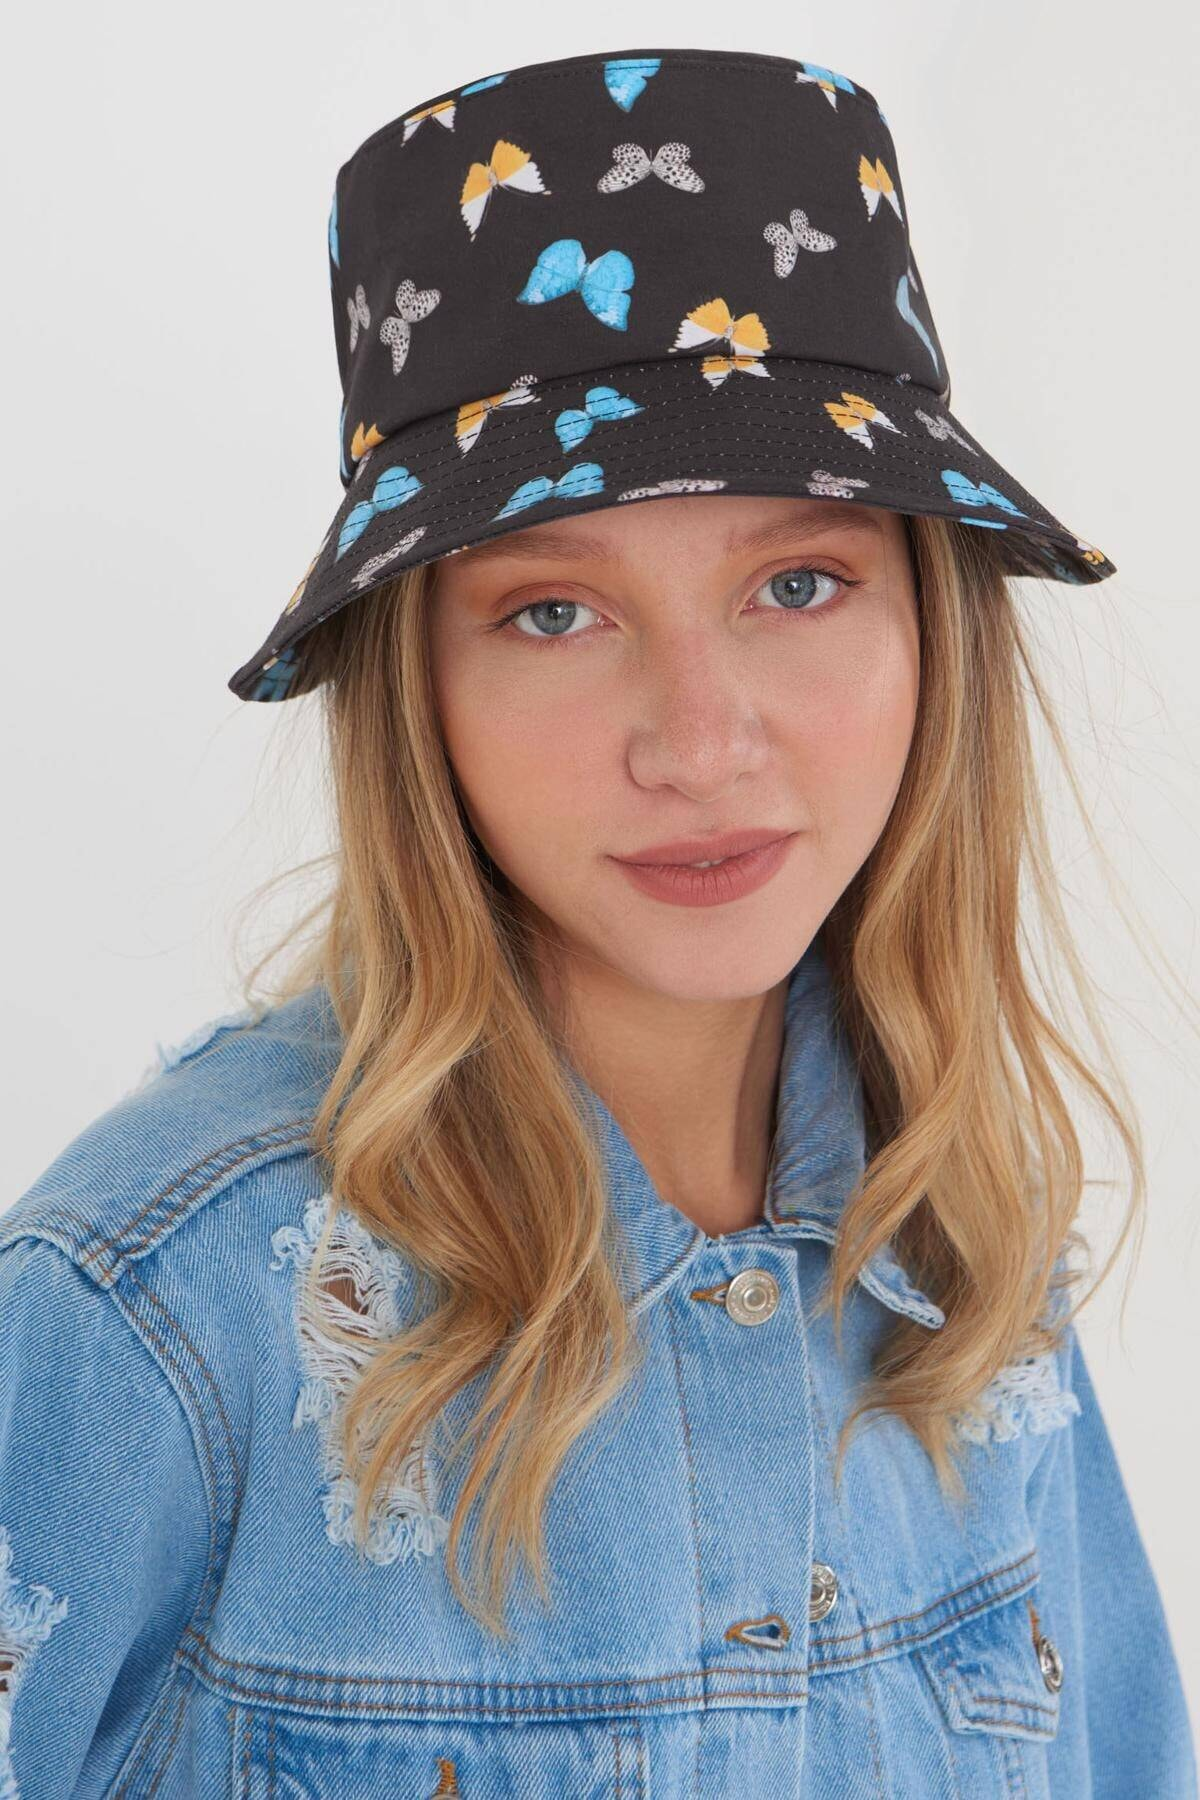 Addax Kadın Siyah Mavi Şapka Şpk1045 - E1 Adx-0000023856 1